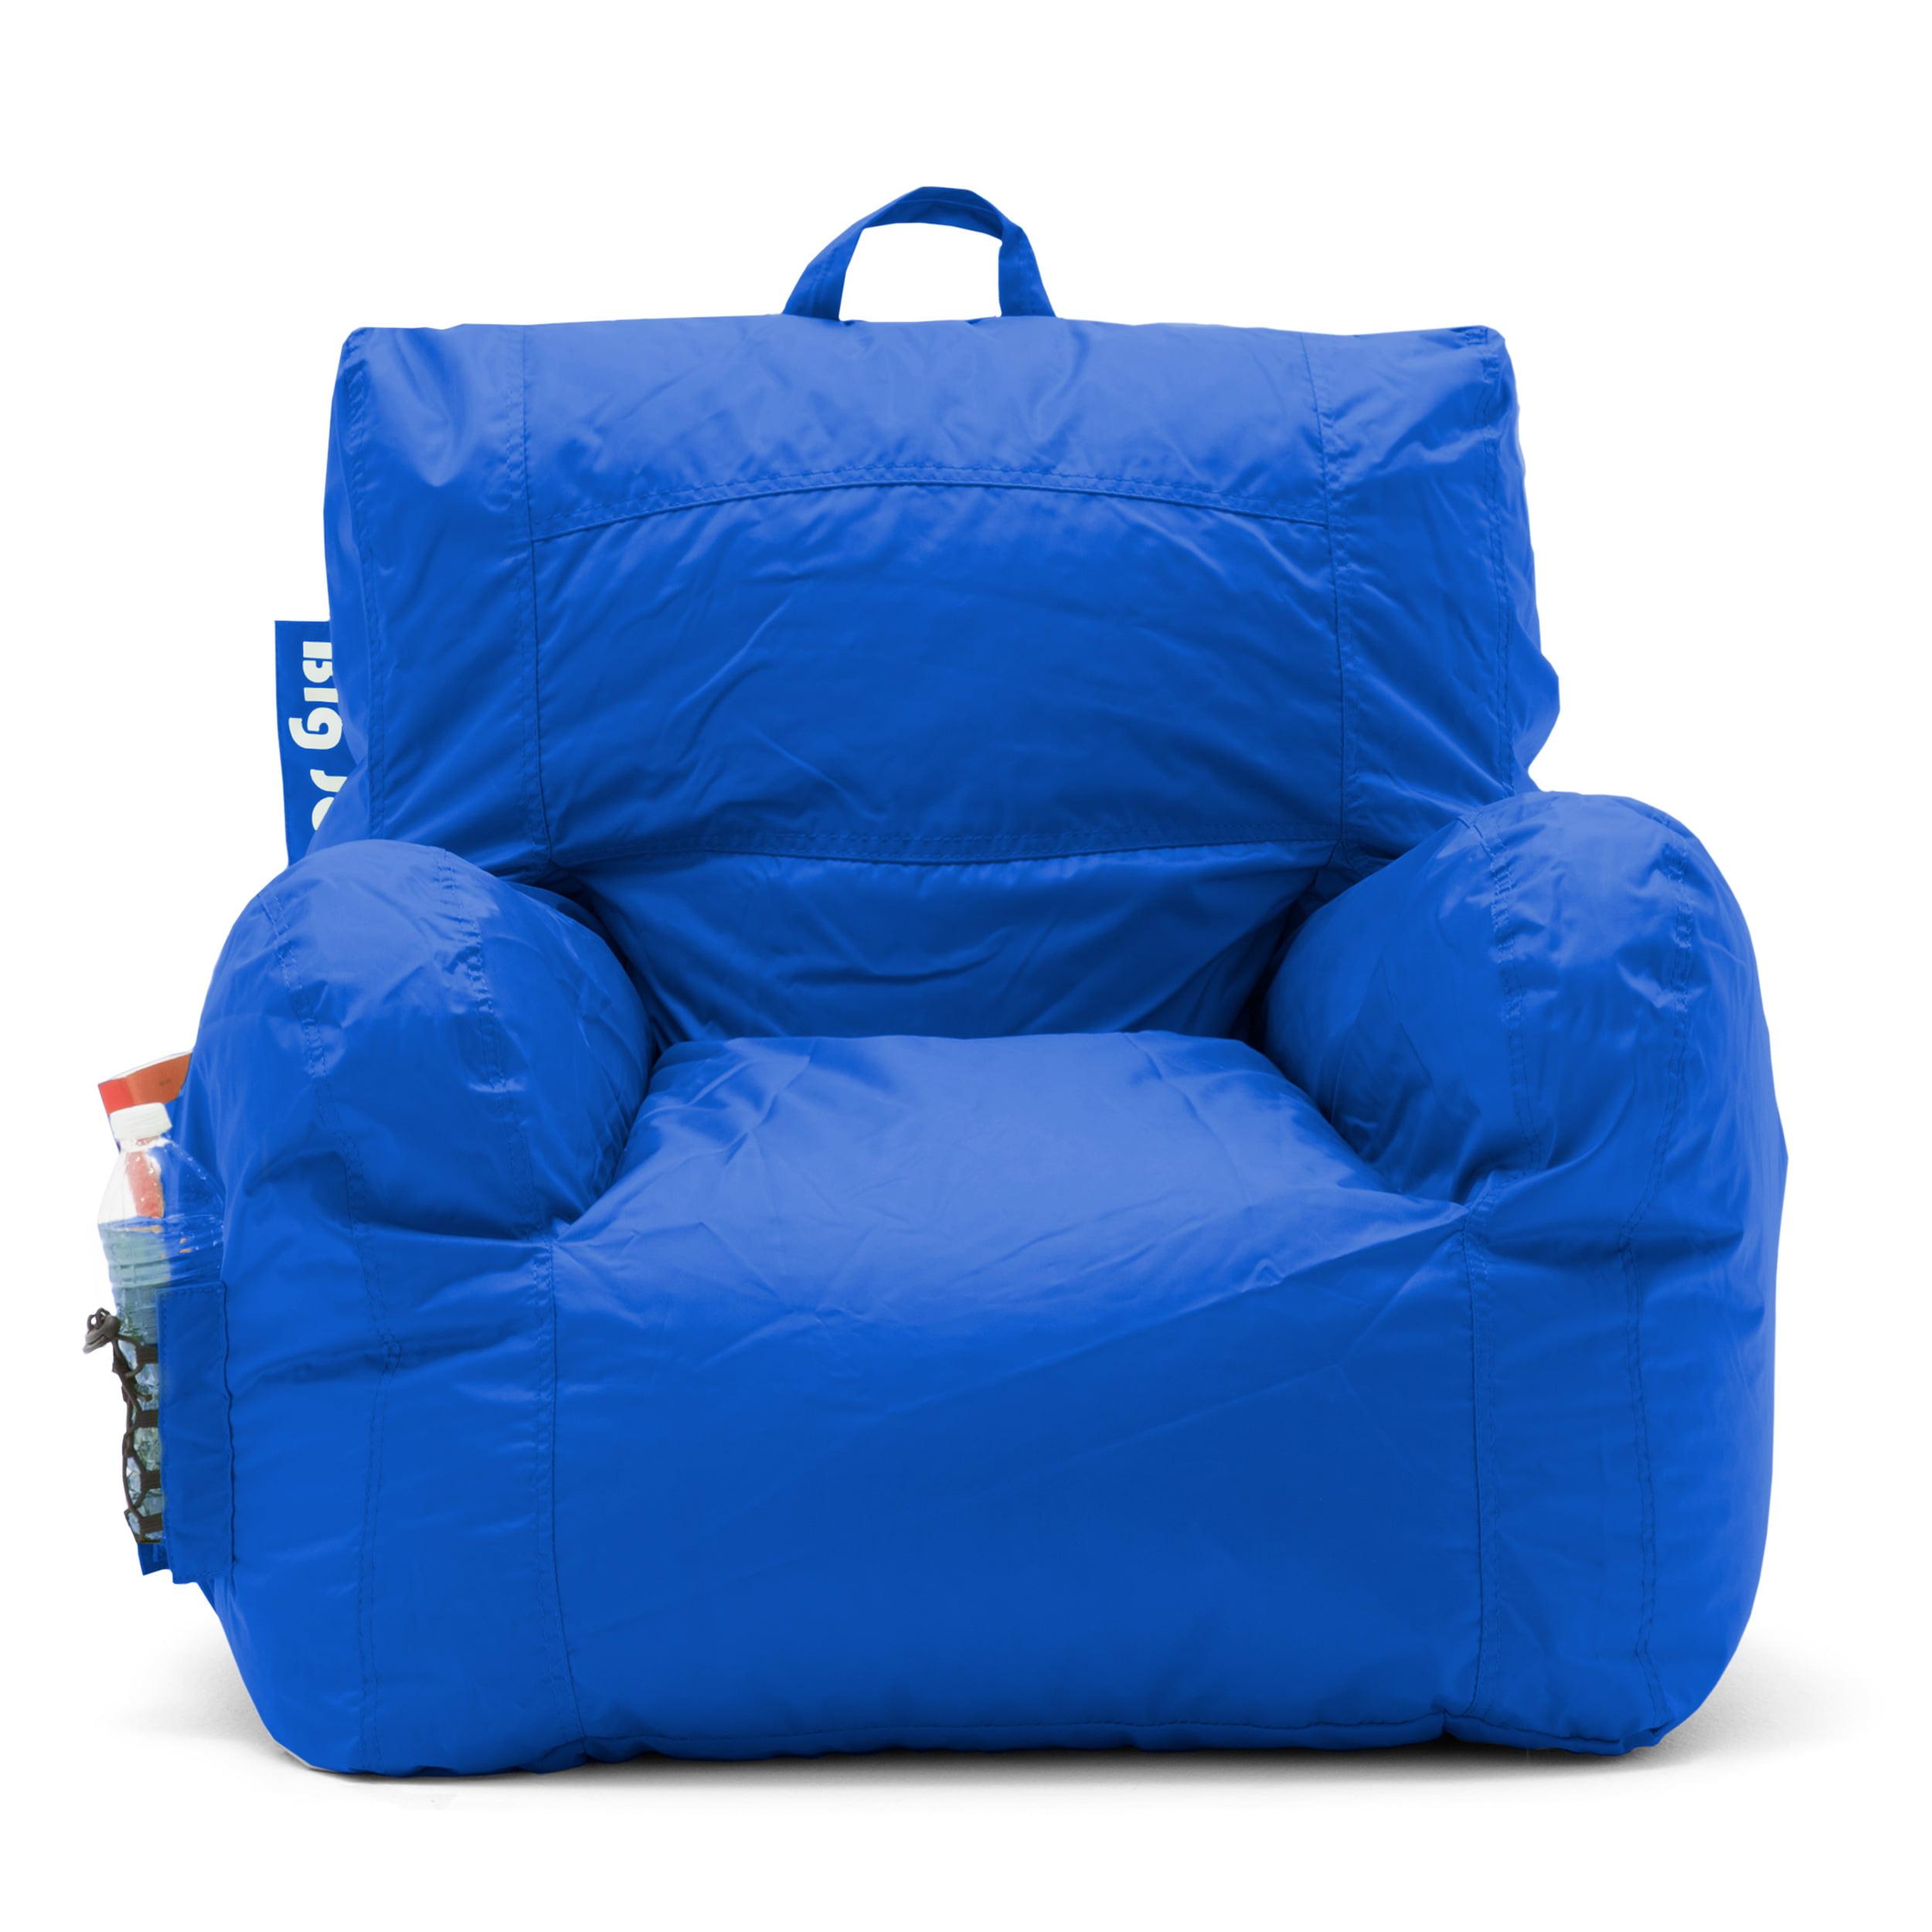 Bean Bag Chair Big Joe Blue Cozy Waterproof Seat Dorm ...